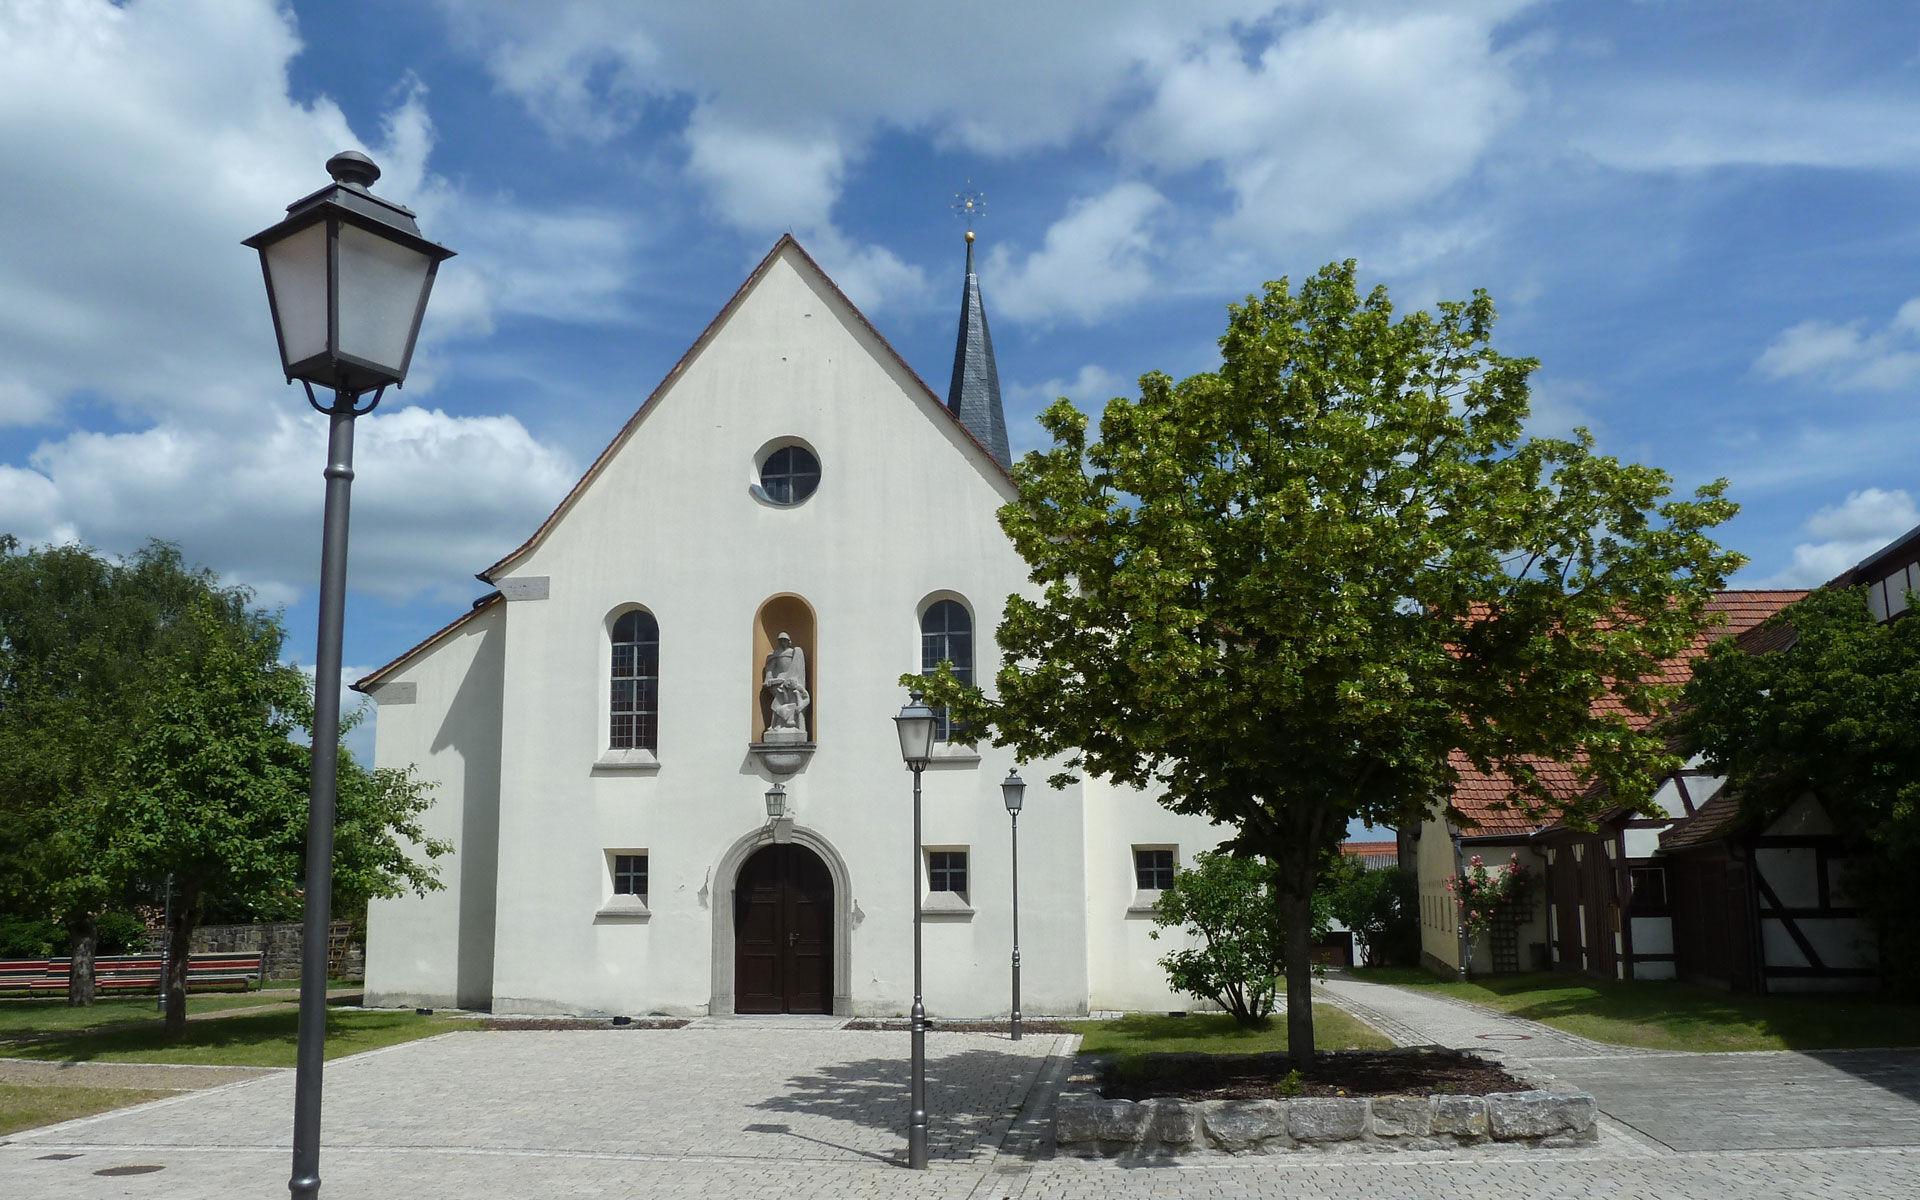 Eltingshausen_Dorfplatz_01